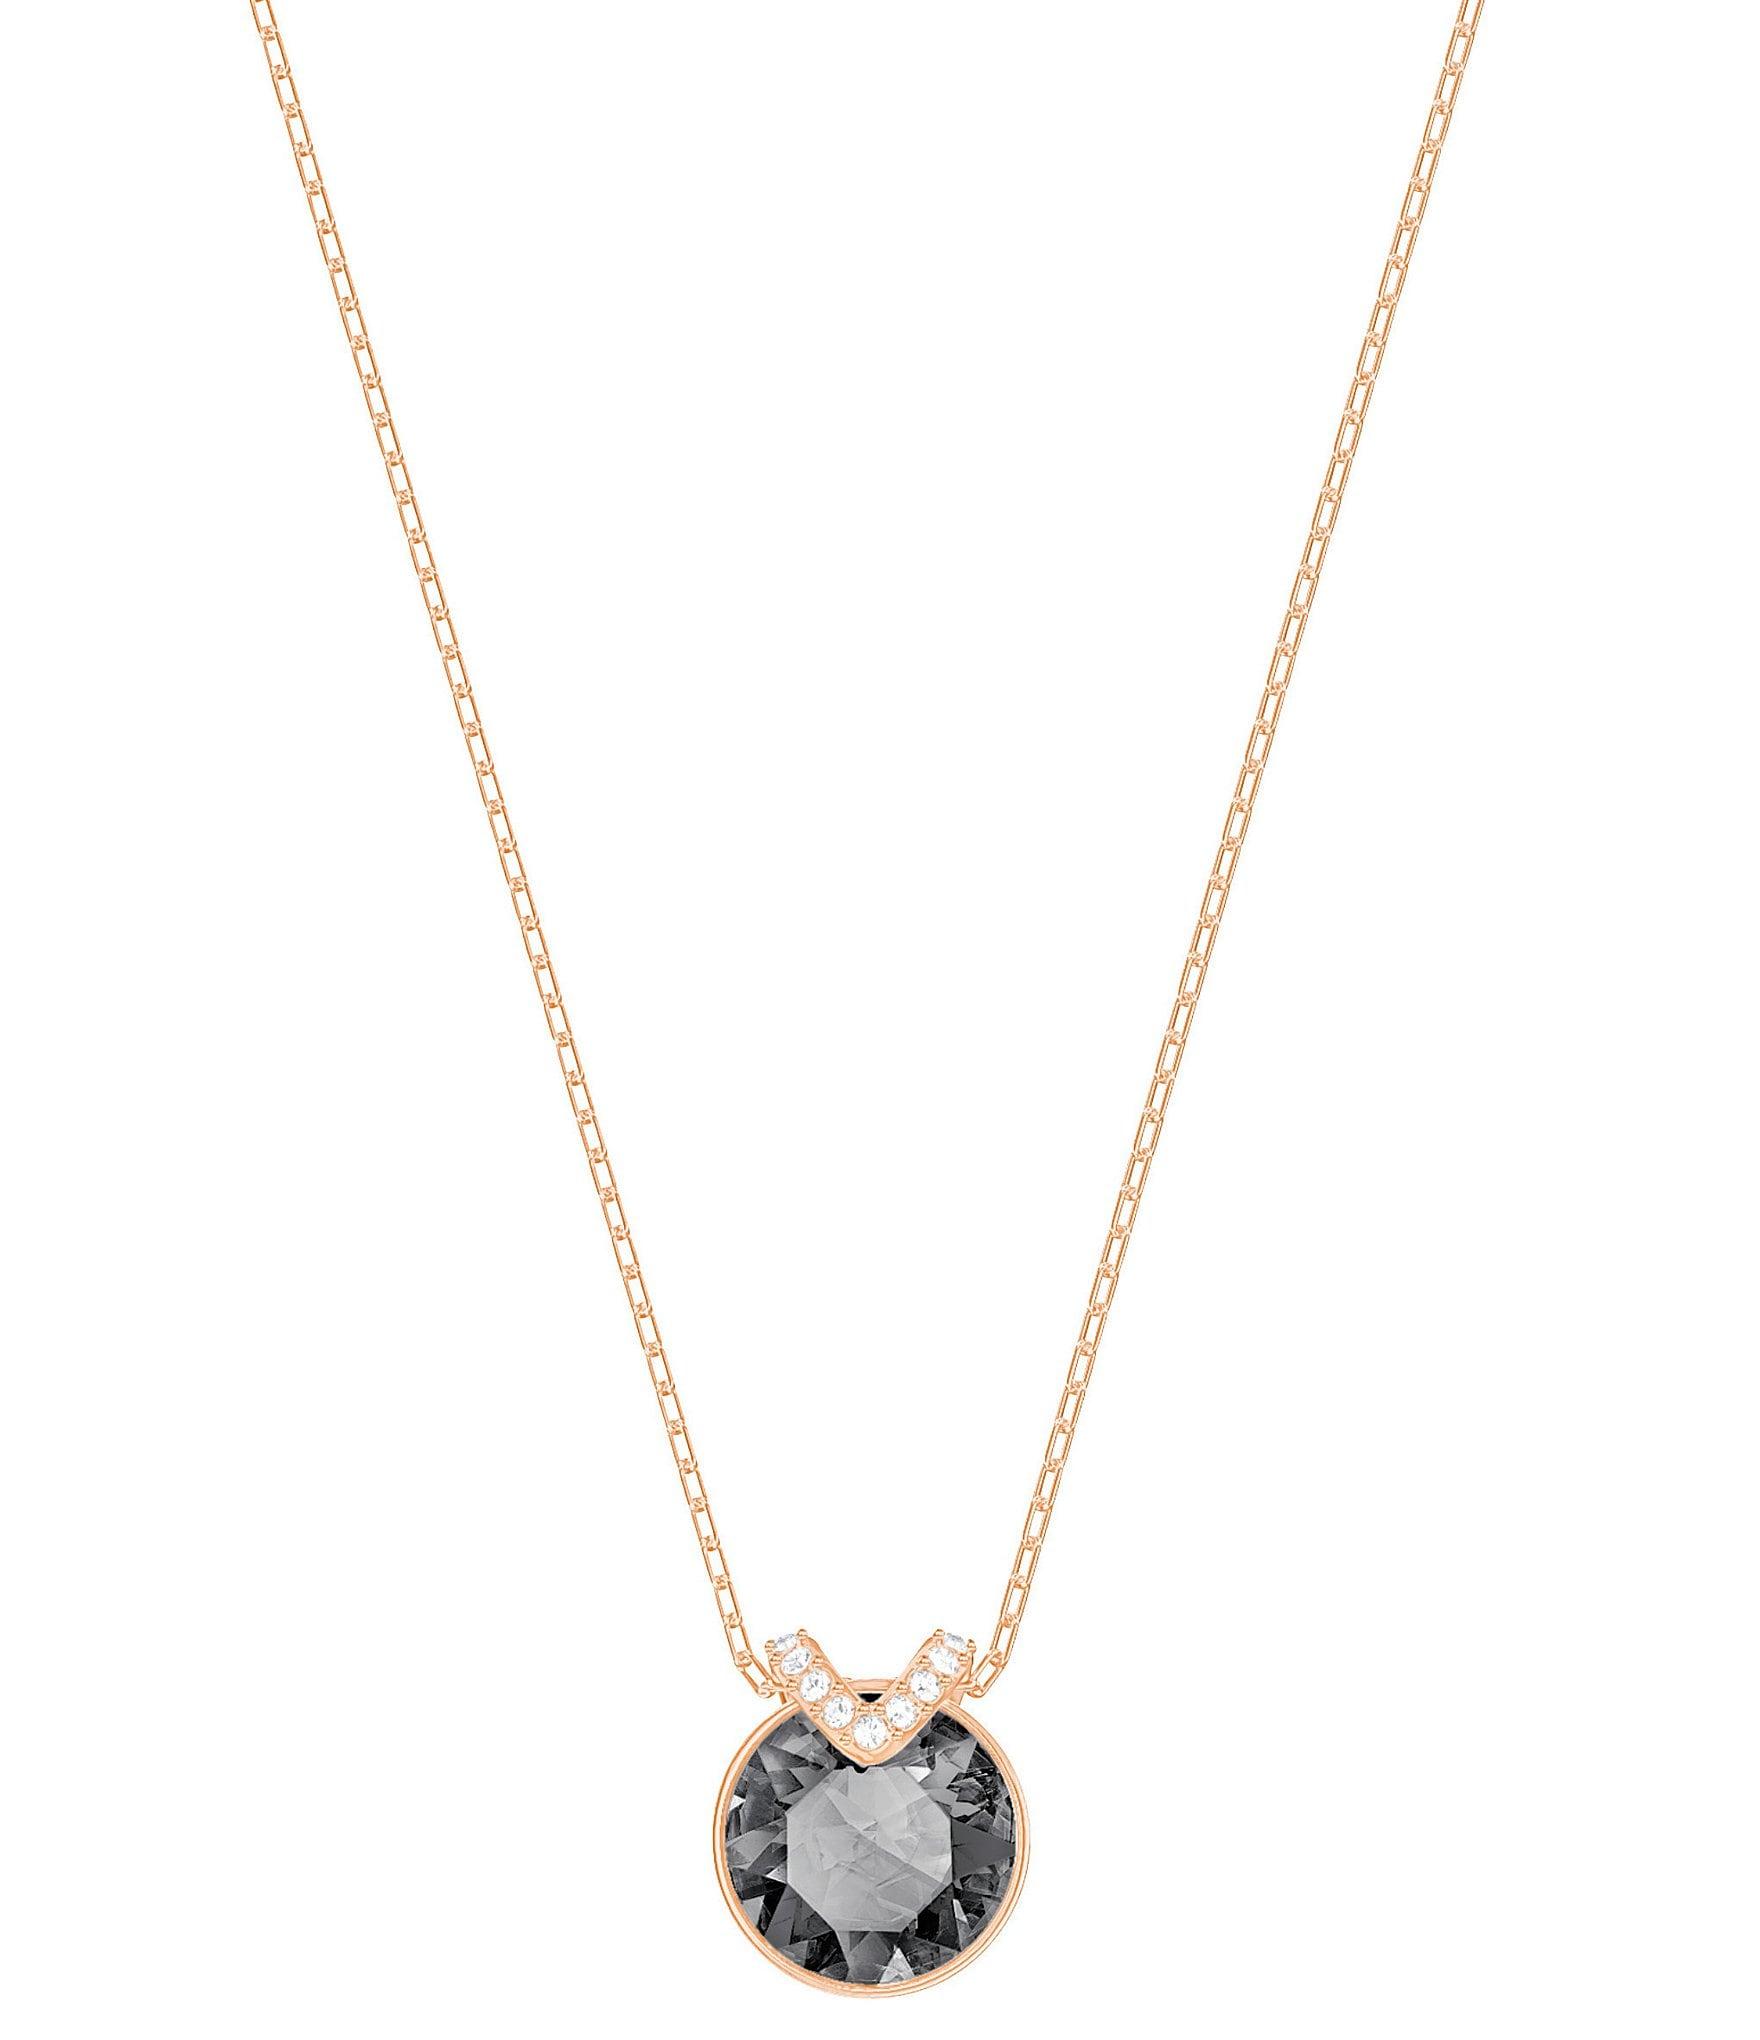 Swarovski Bella Crystal Pendant Necklace